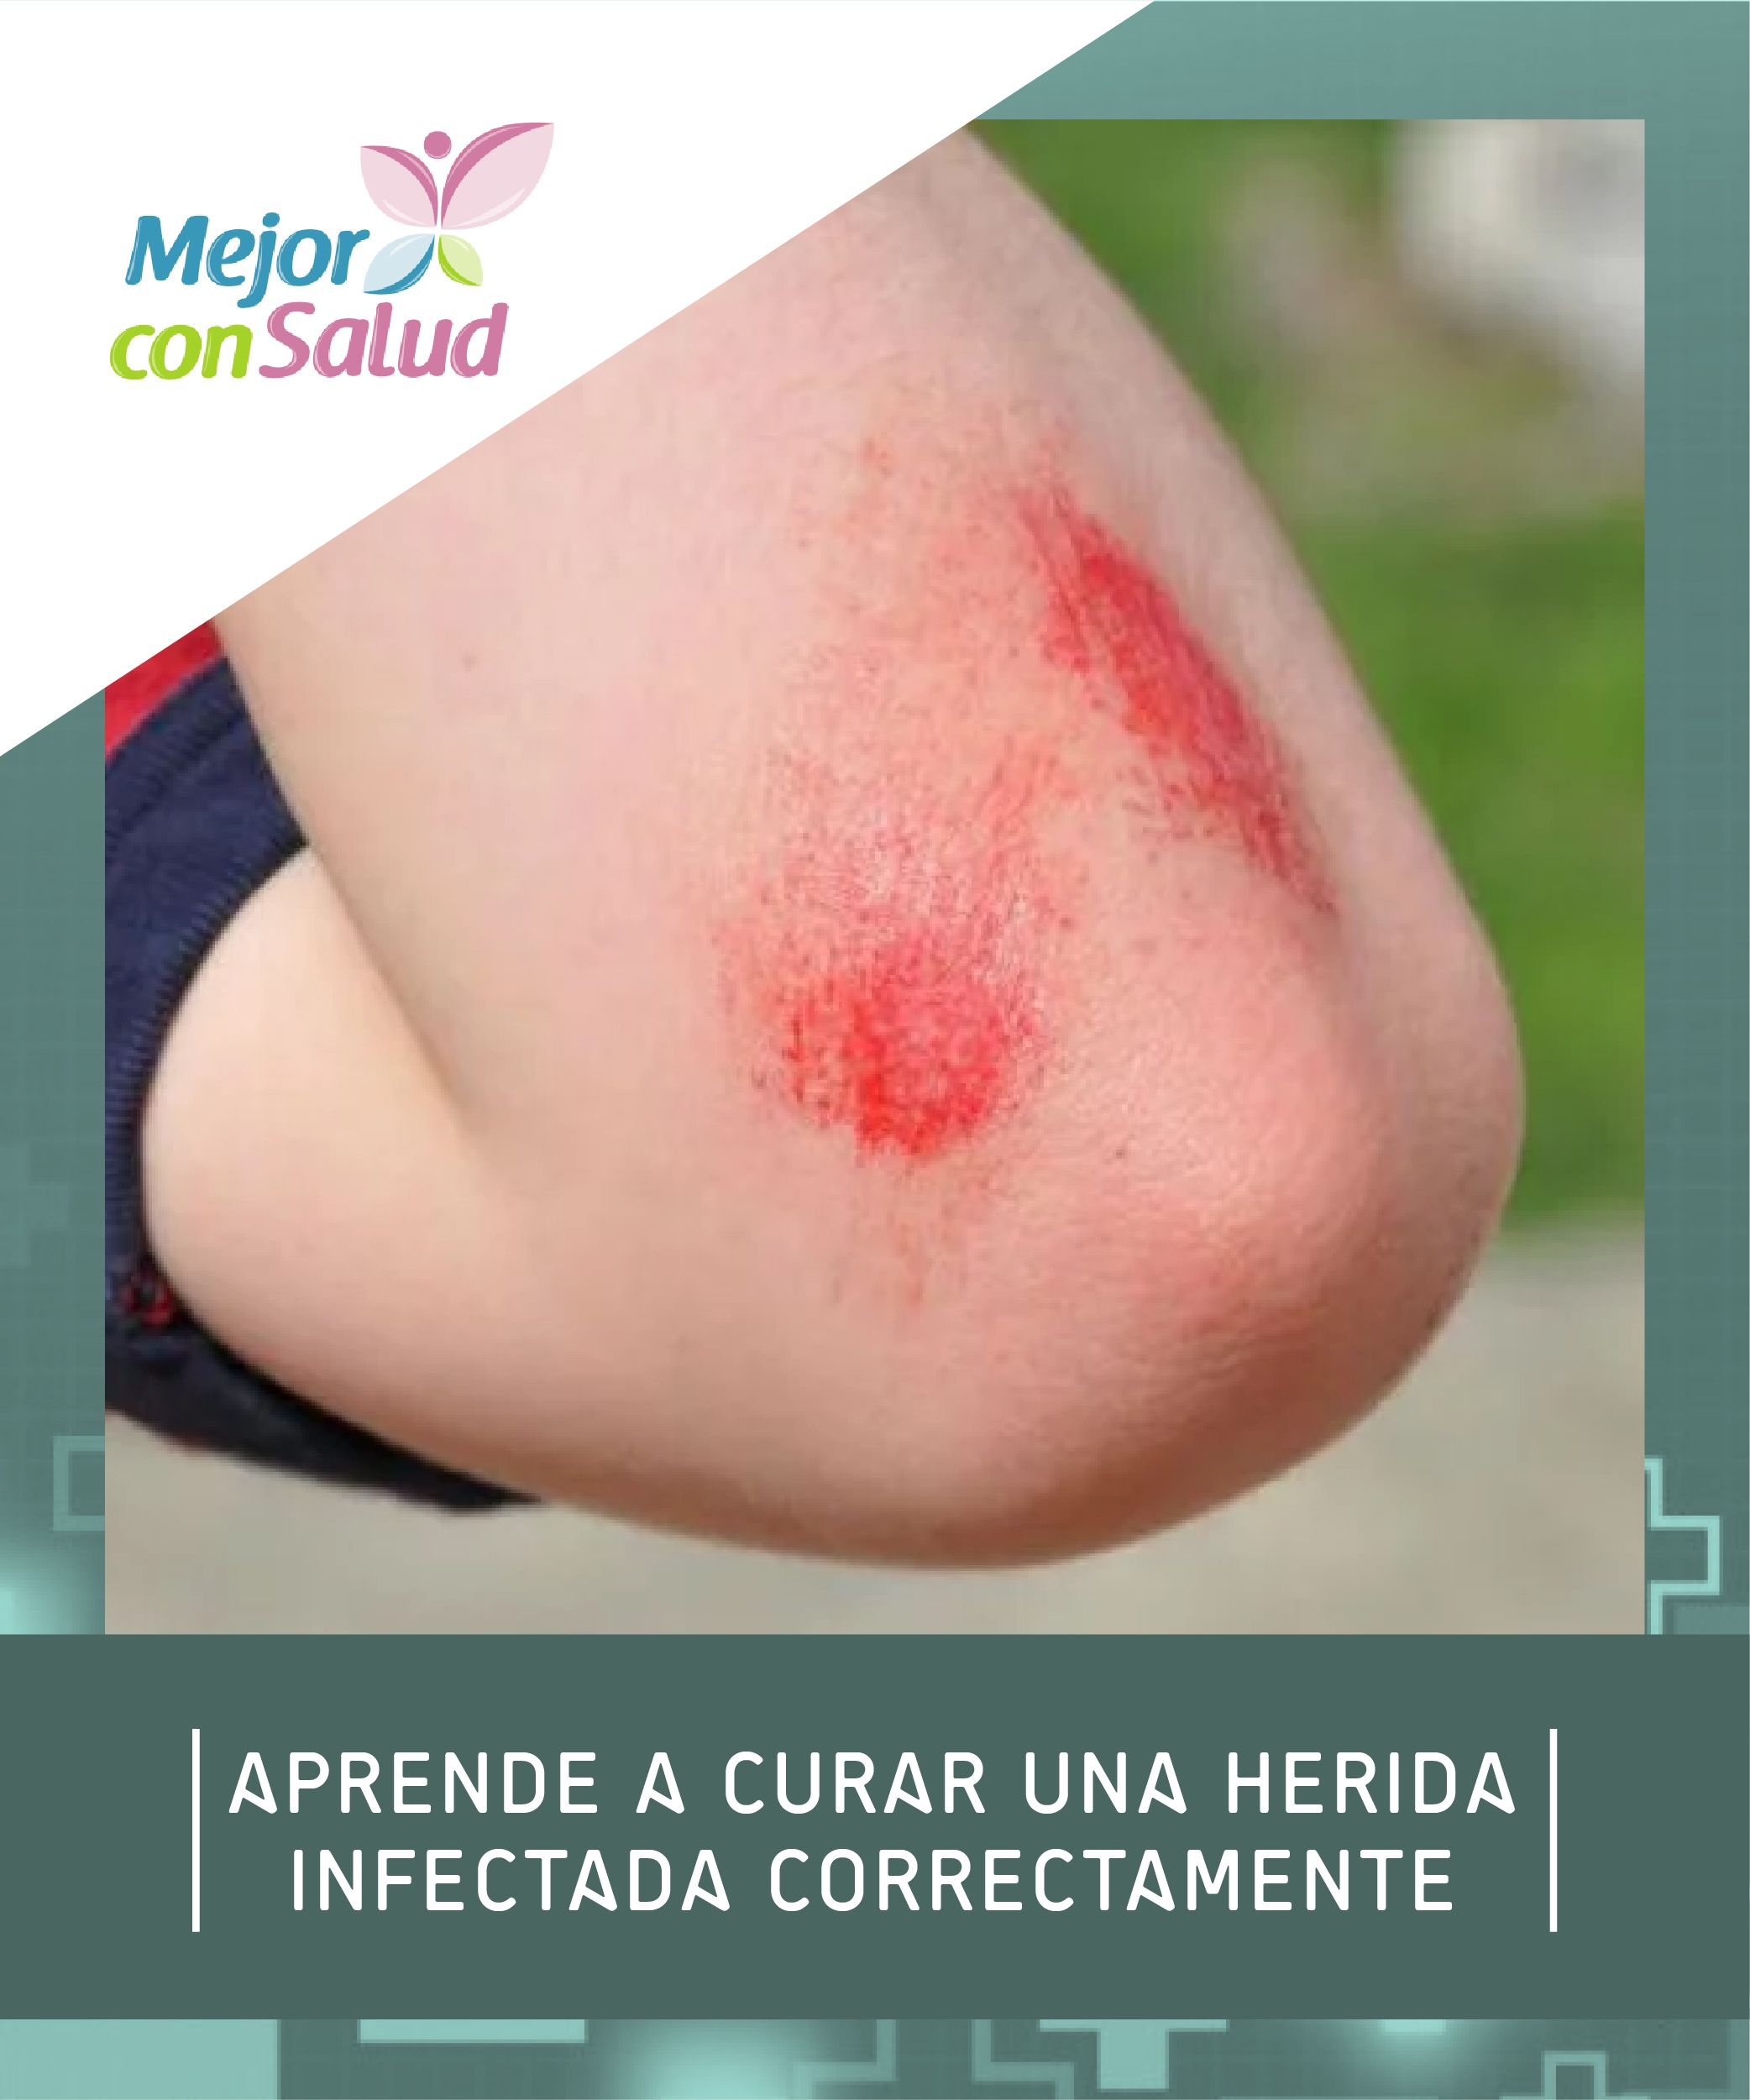 herida infectada tratamiento